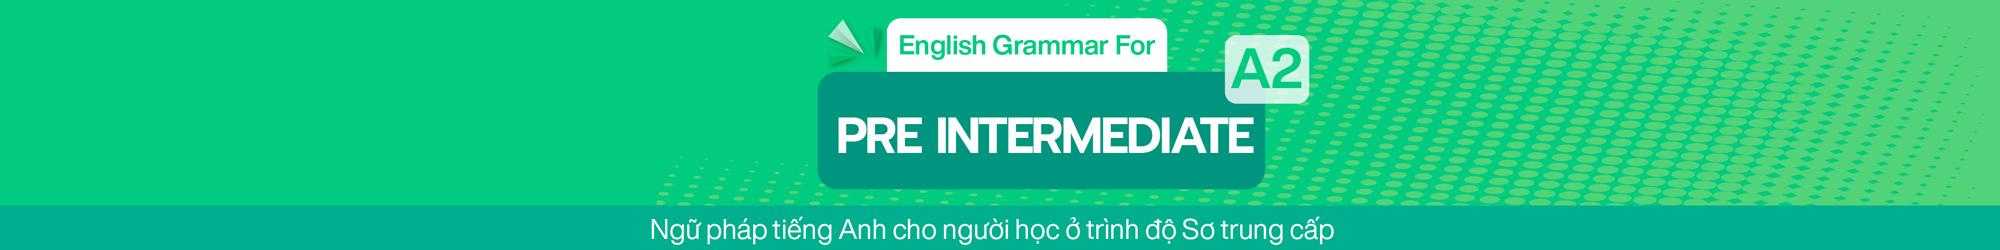 English Grammar For Pre Intermediate (A2) banner